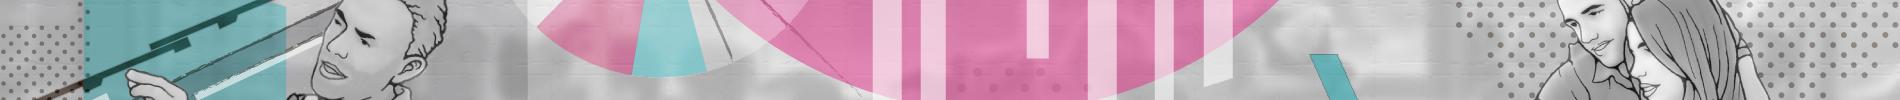 forsidebillede_tegning_handverker_100_bred